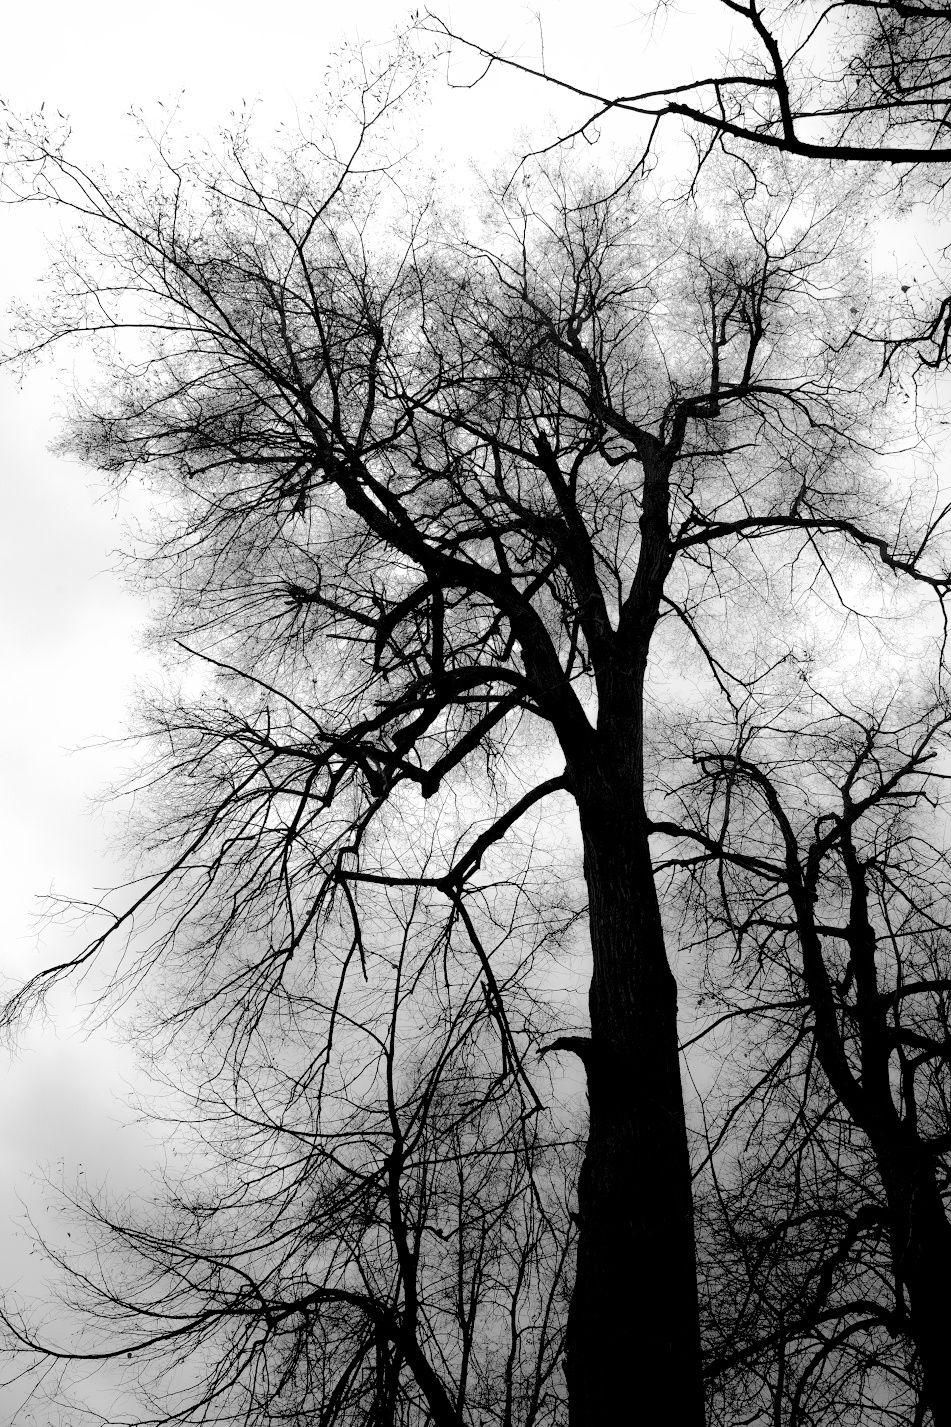 Capillaries by Ivan Popov on 500px